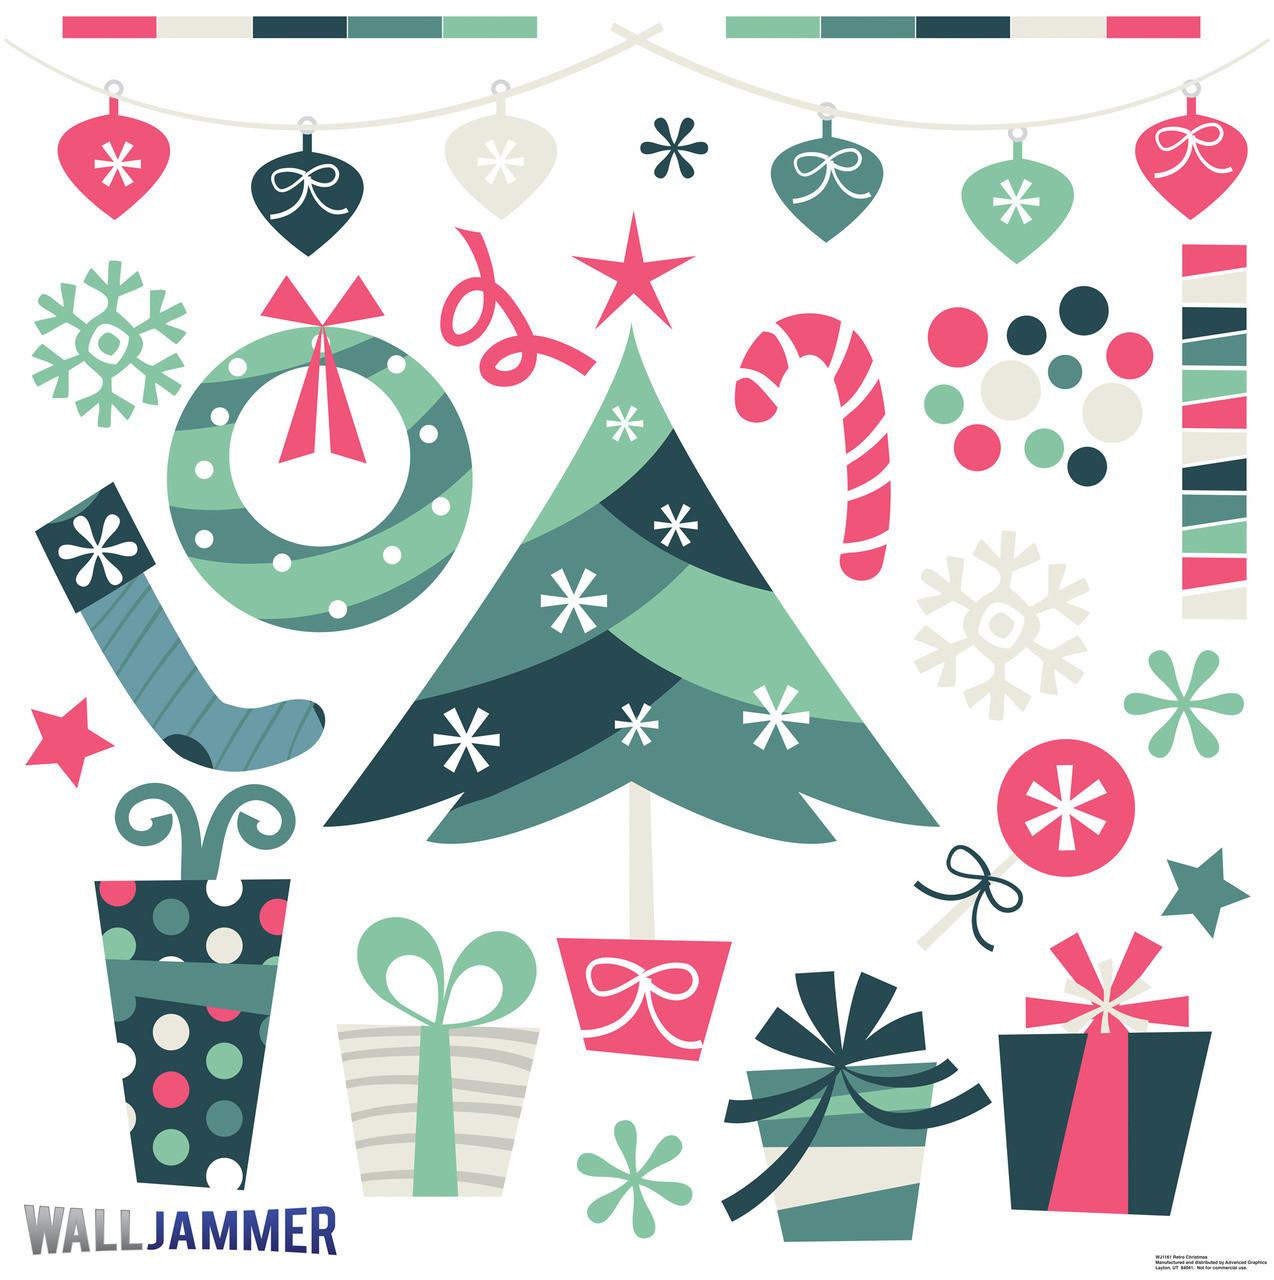 Life-size Retro Christmas Wall Decal